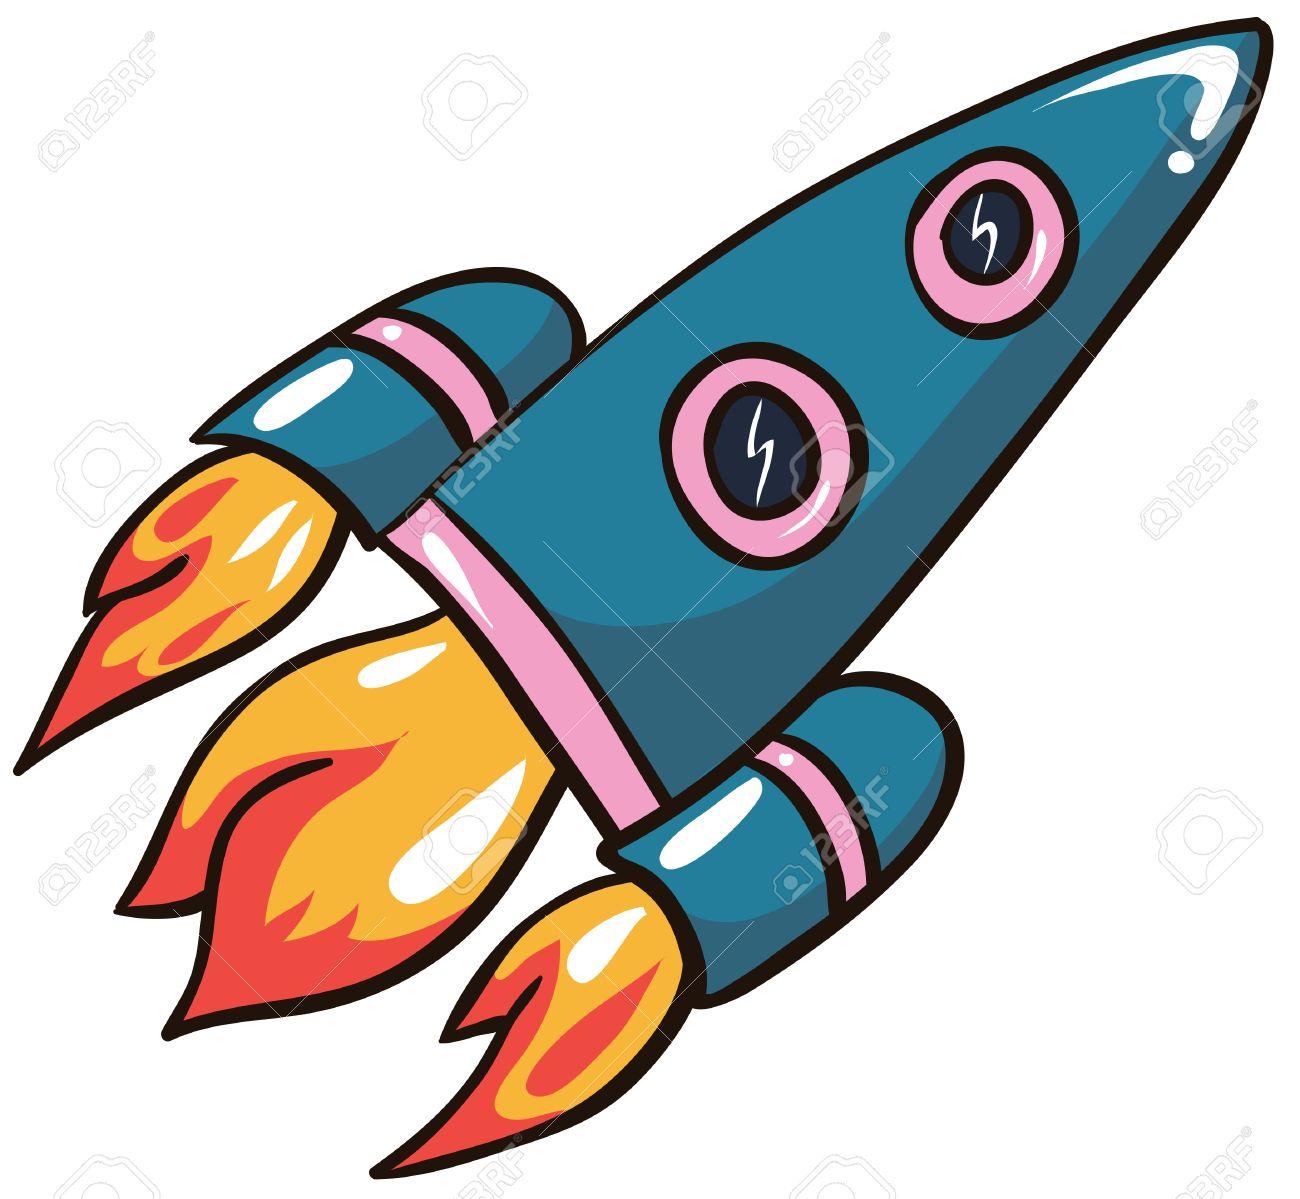 1300x1199 Cartoon Rocketship Image Group